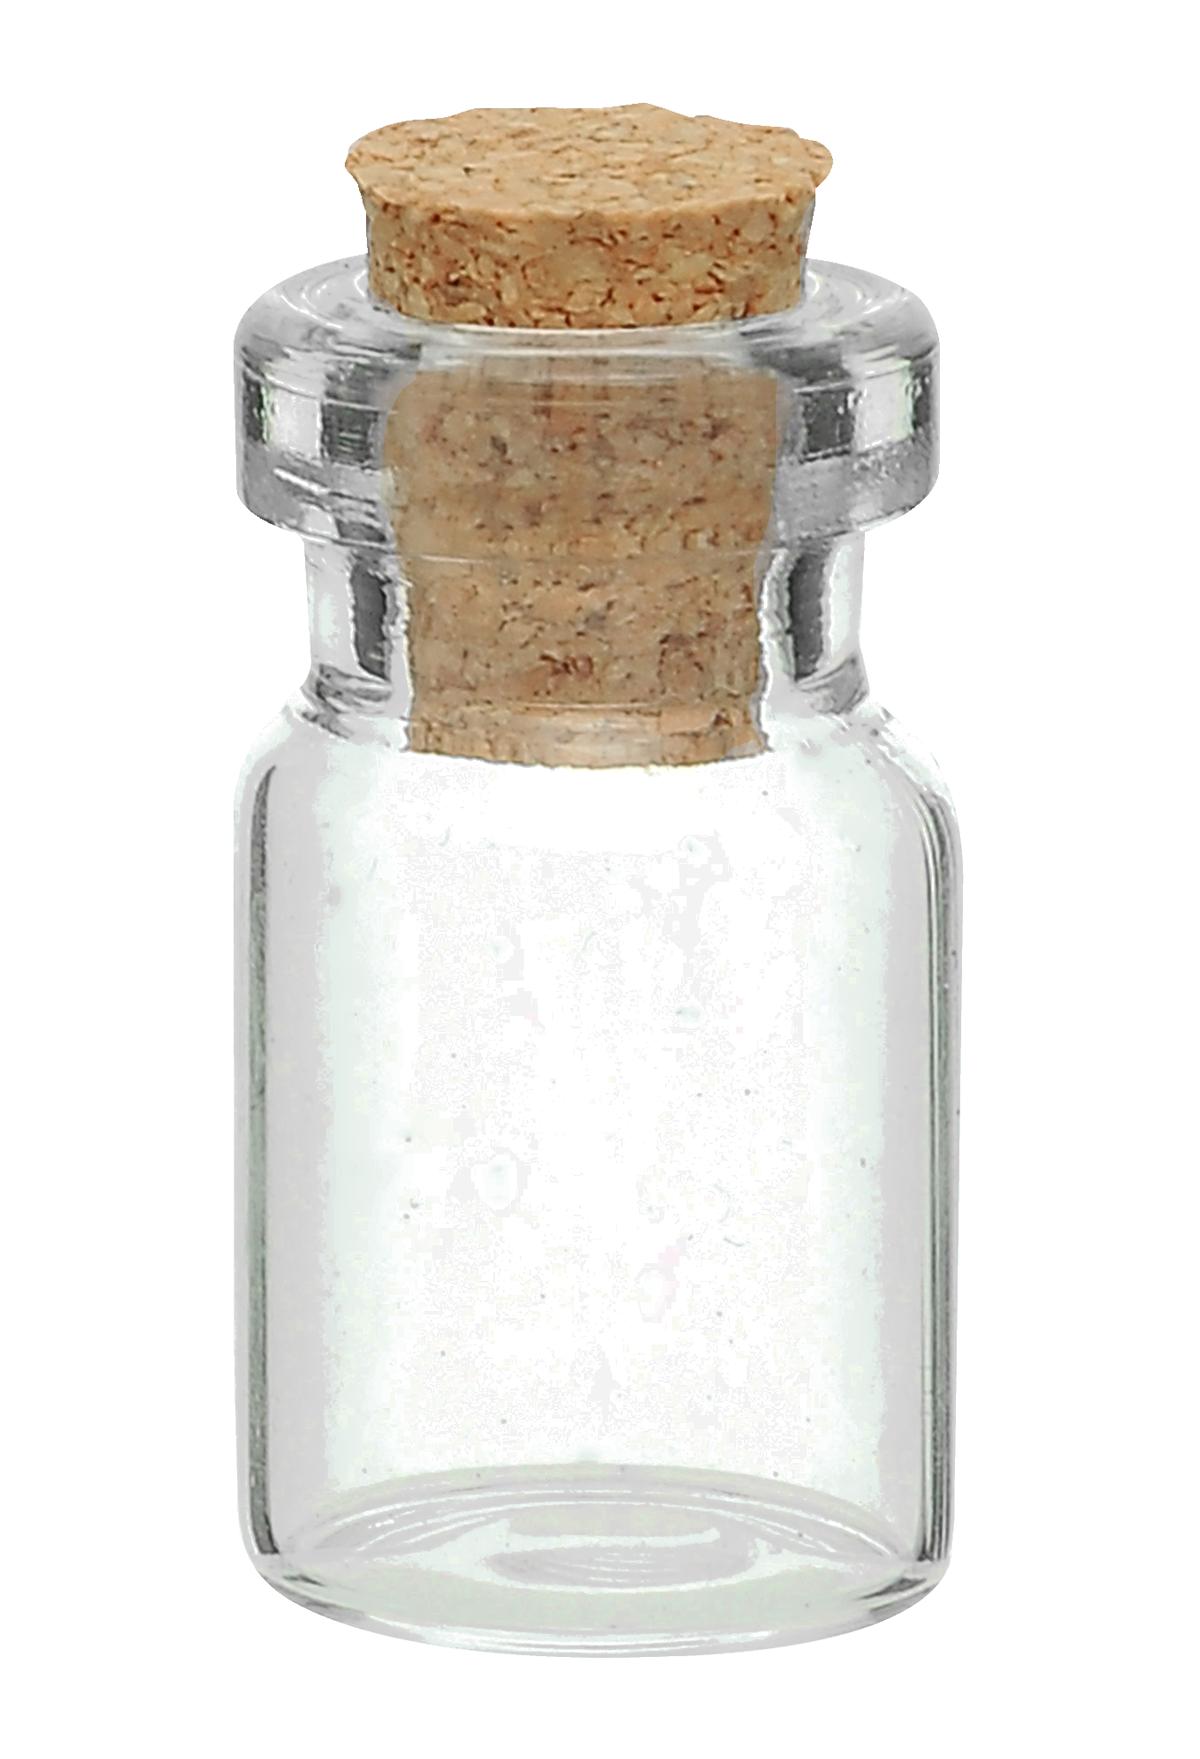 Clear bottle png. Images pngpix glass jar